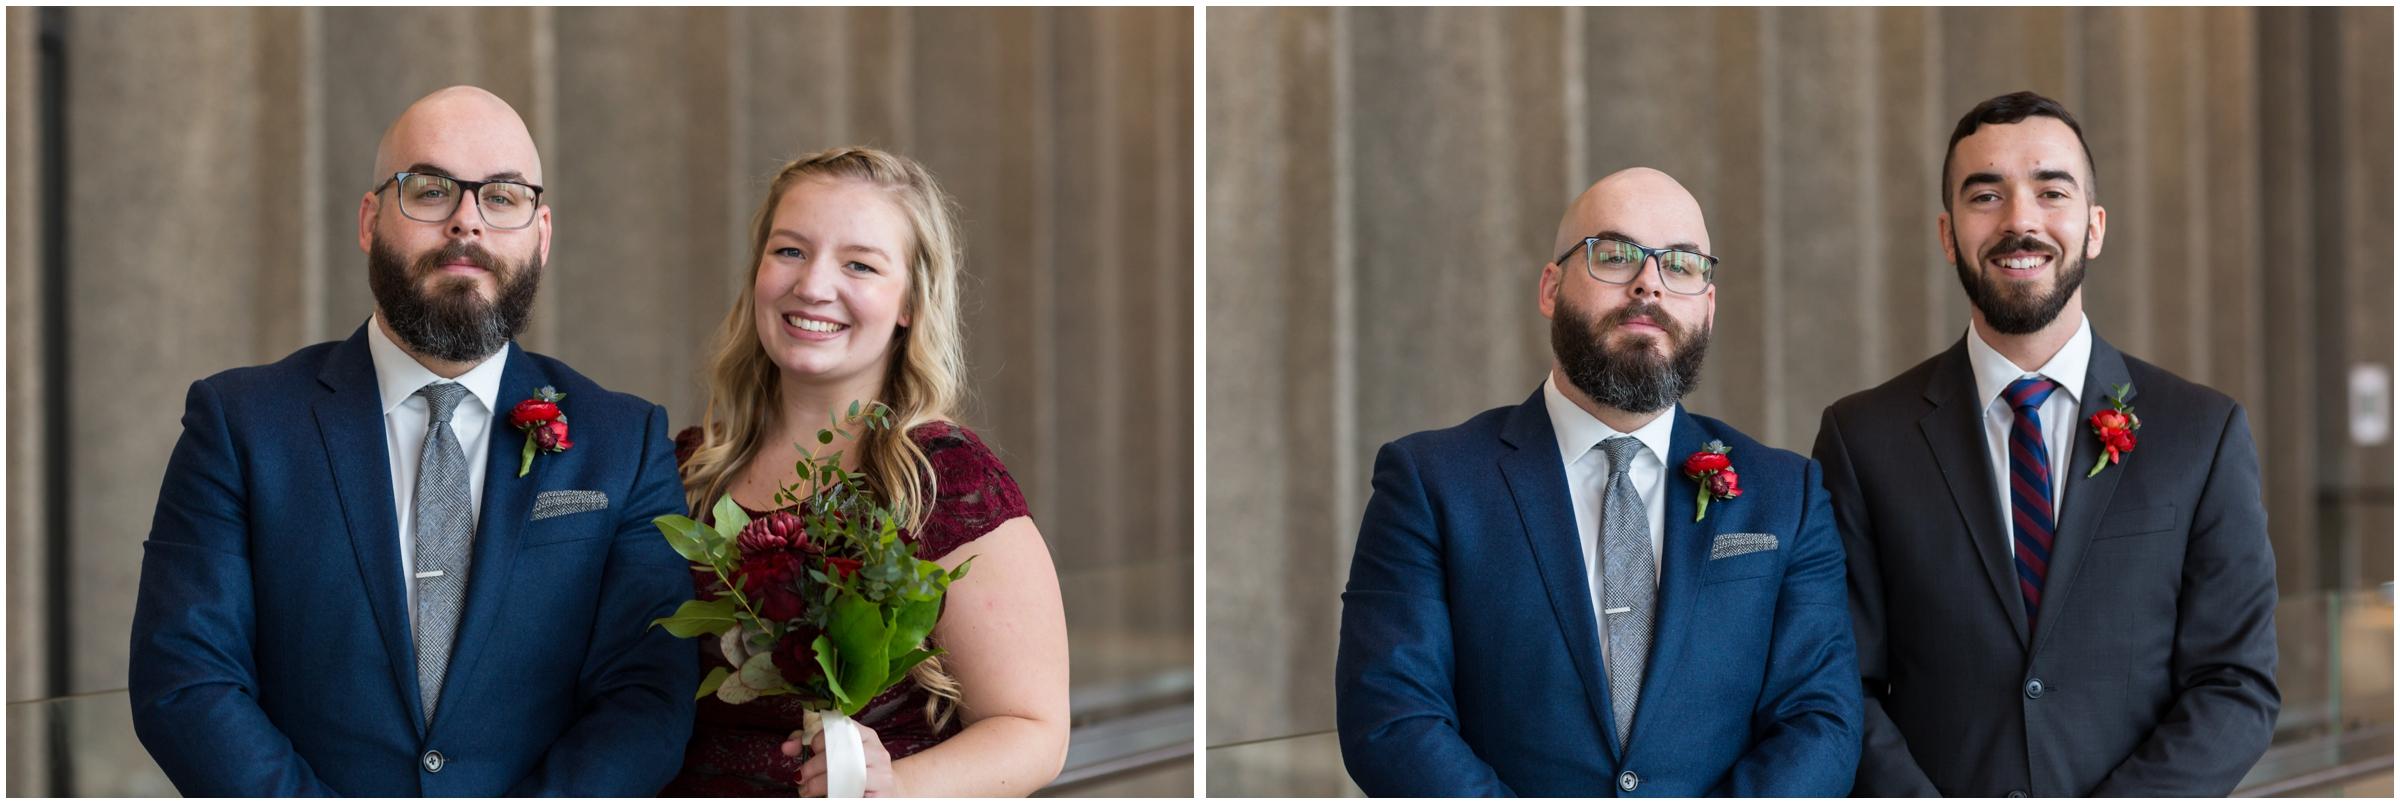 Ottaw Wedding Allison Andrew - (Selena Phillips-Boyle)_0046.jpg